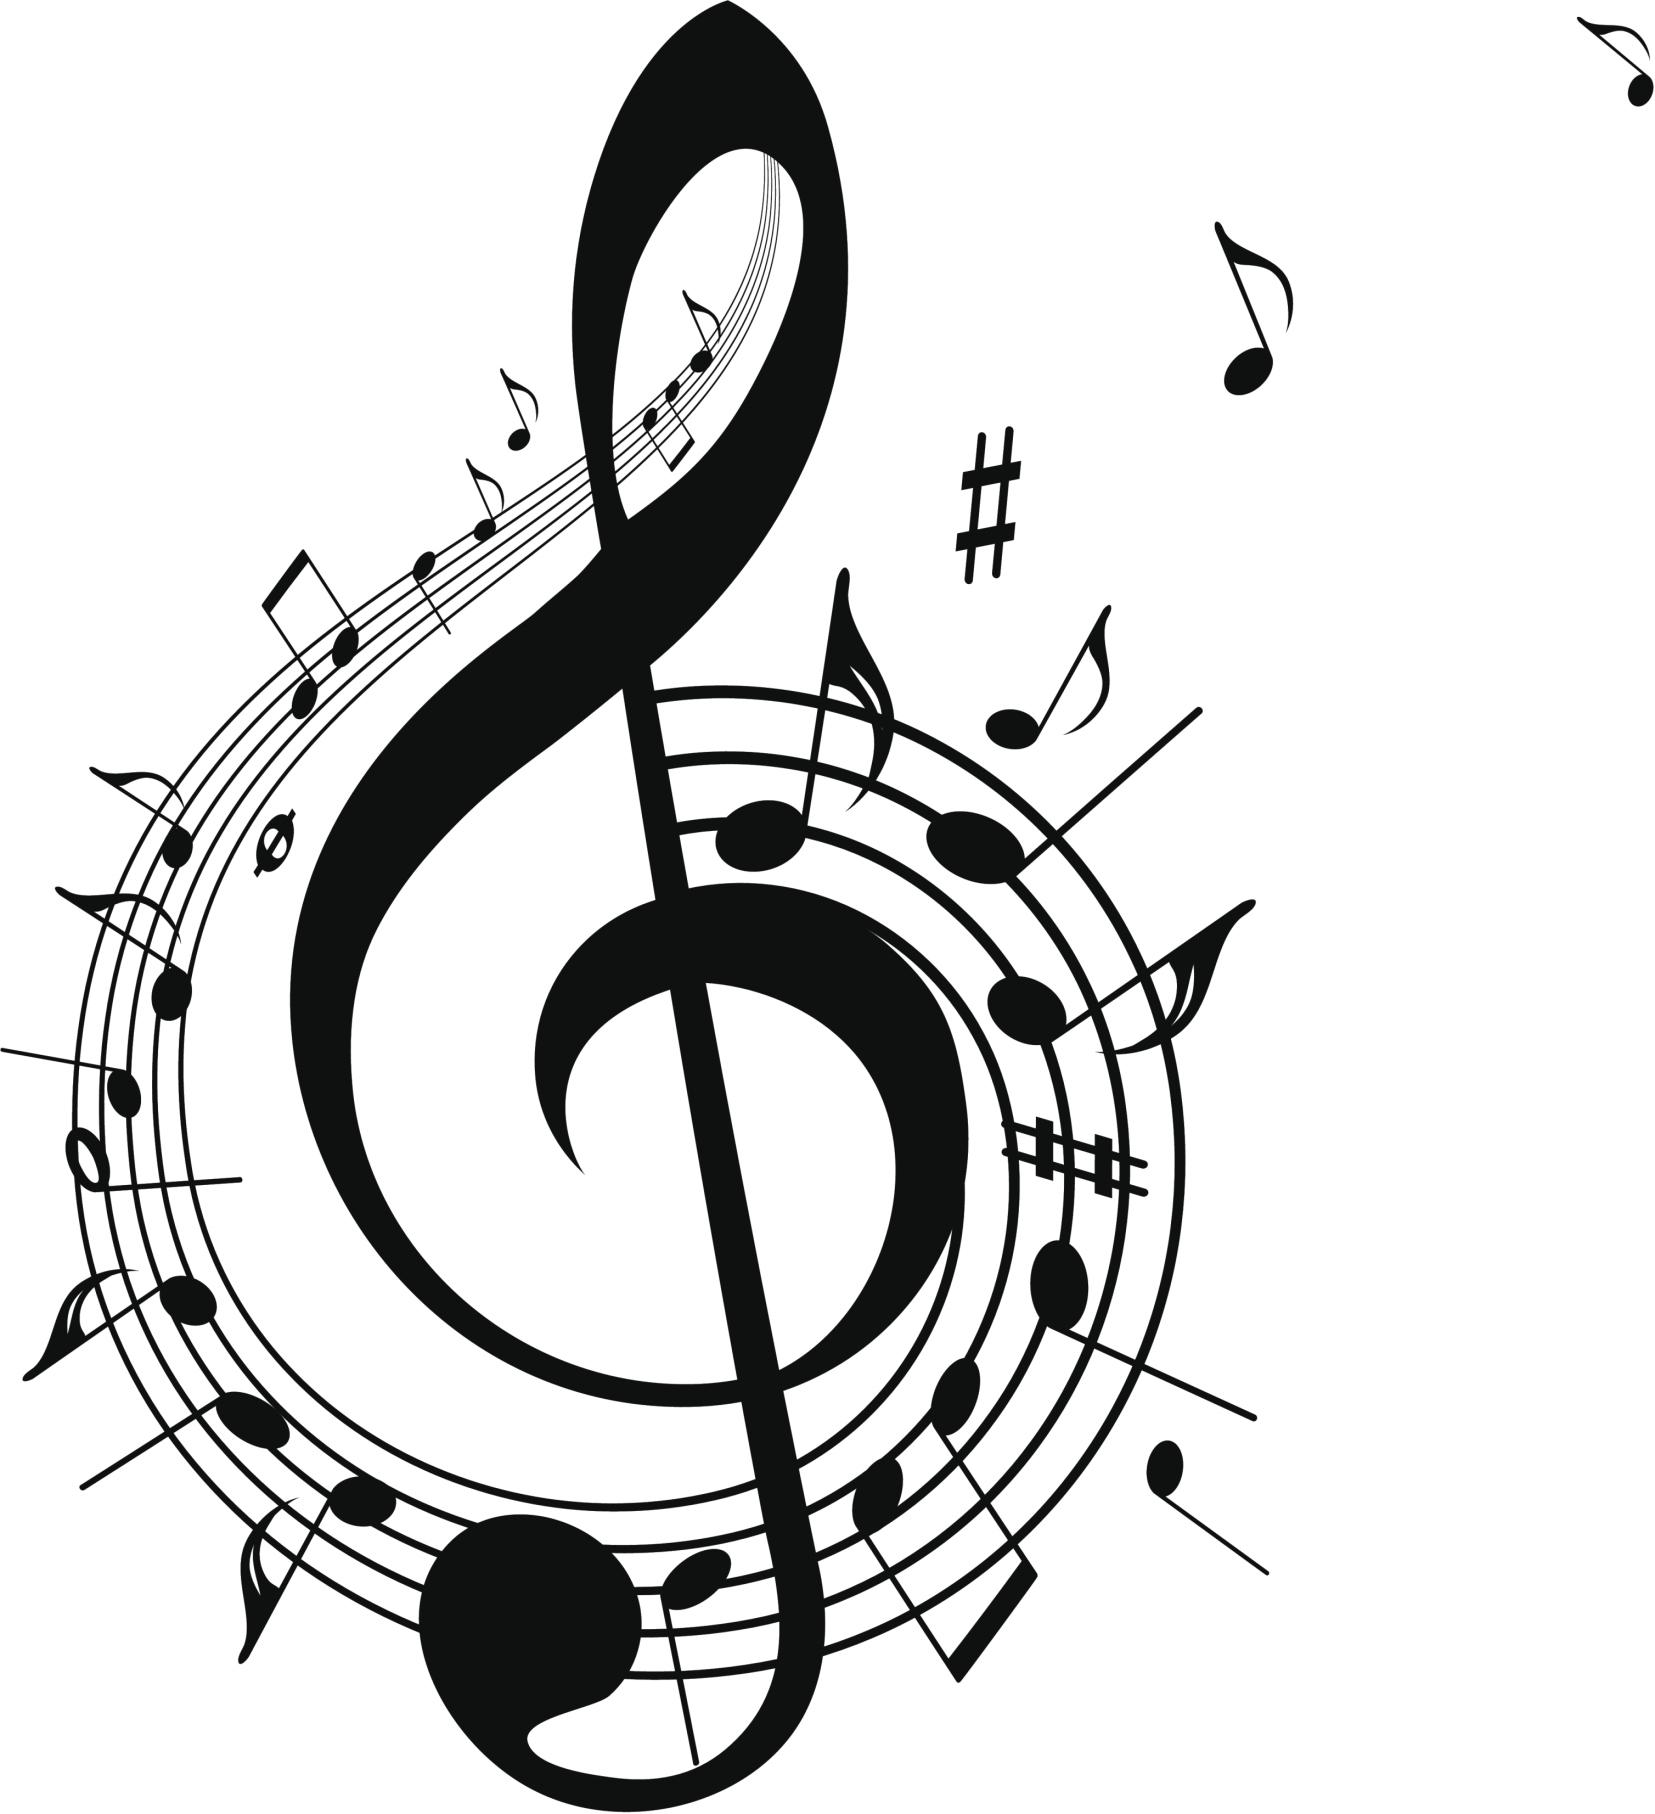 Drawn musician avatar Music Workshop Everyone Music Choral